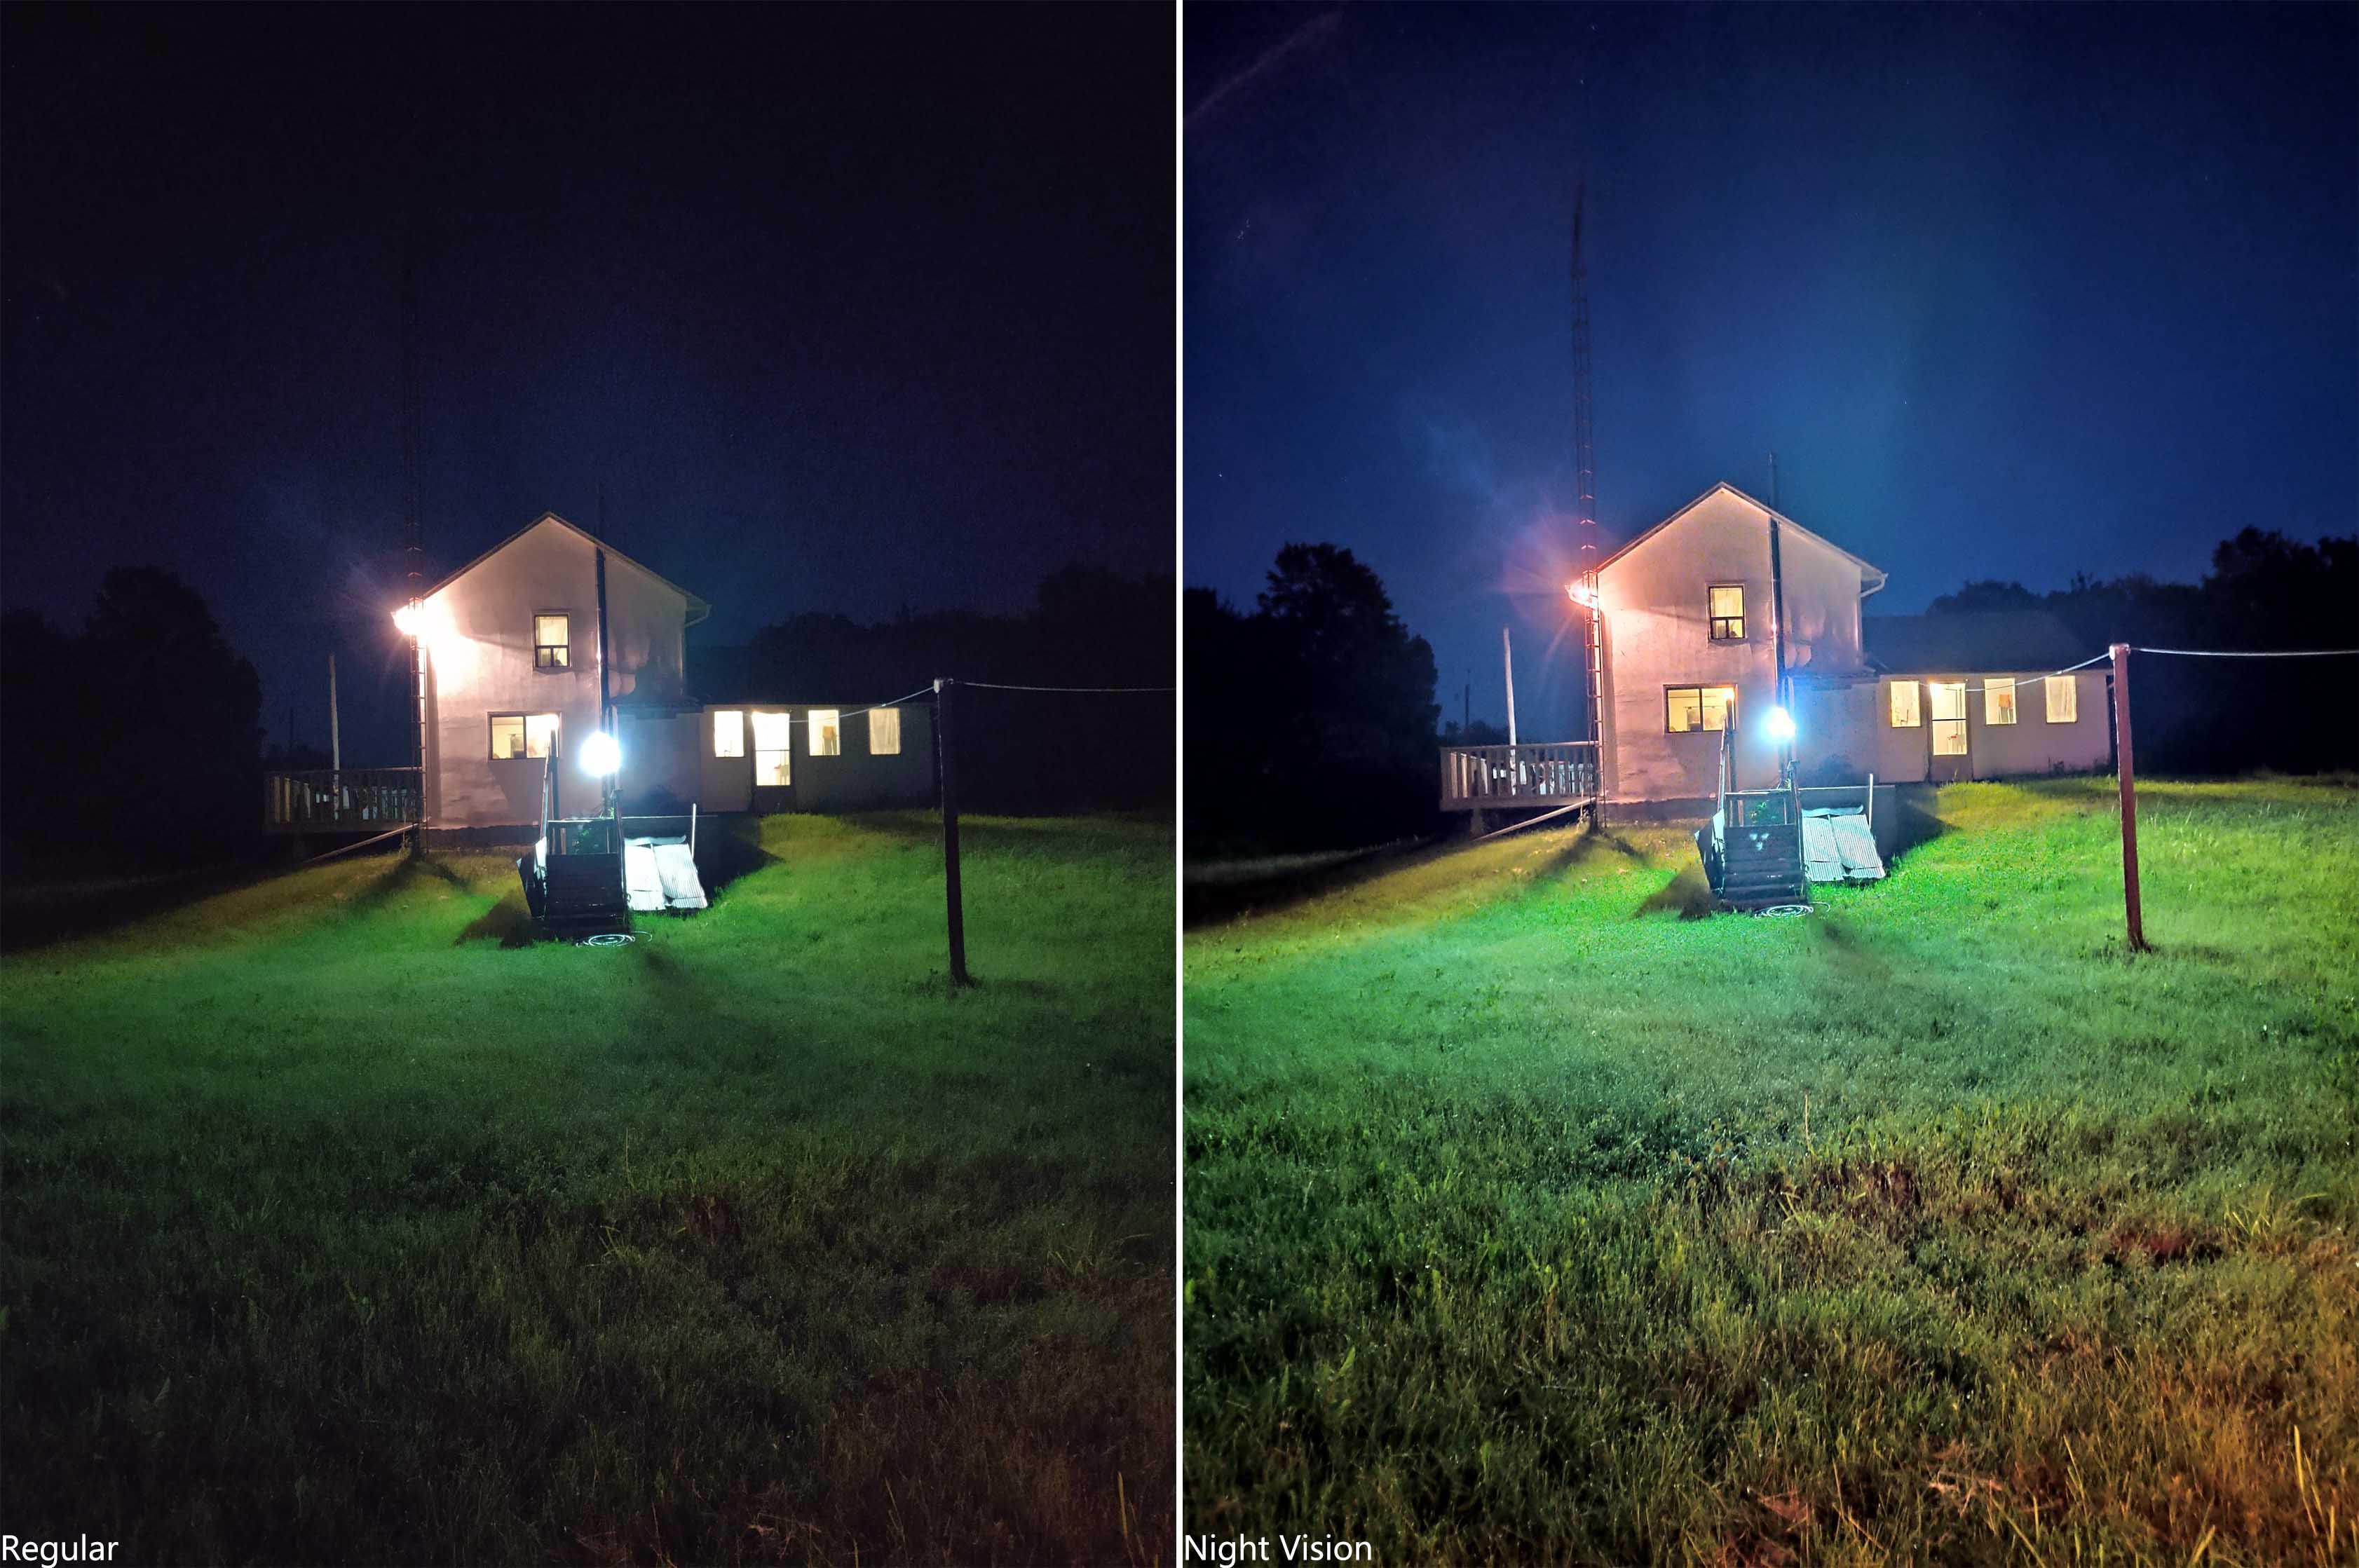 Moto Z4 Night Vision photo